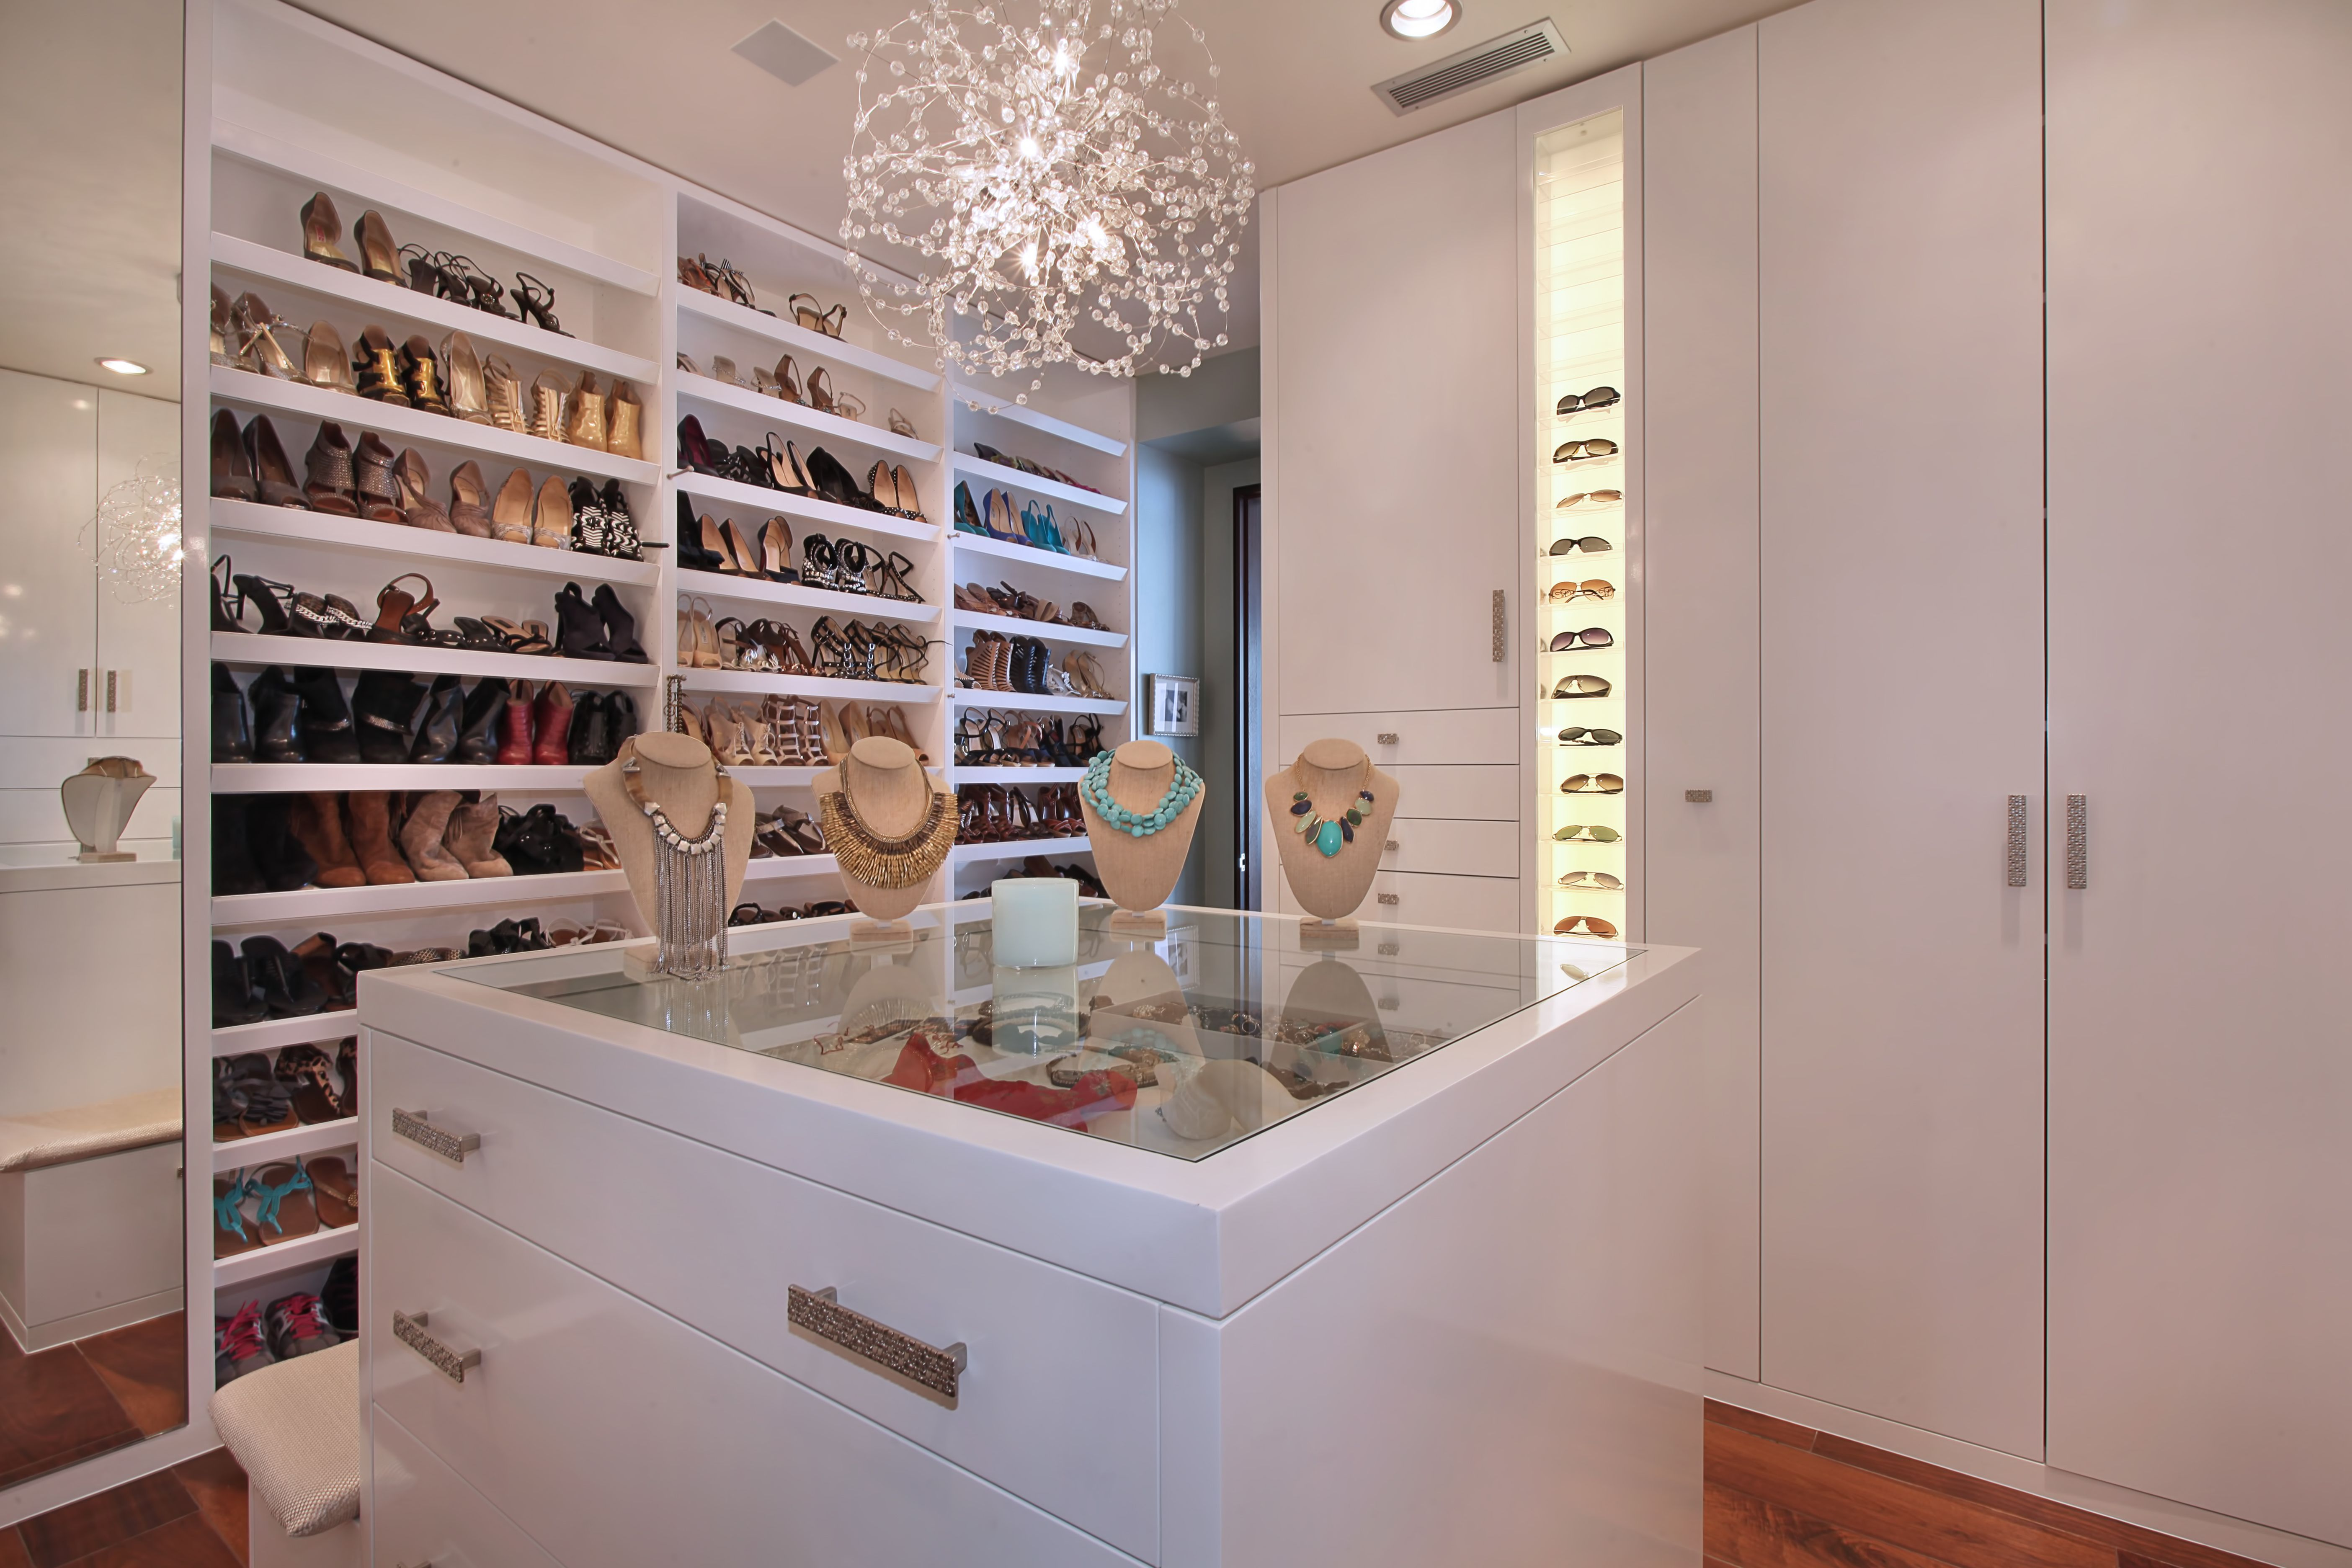 Closet With Sunglasses And Jewelry Display By Jkoegel Via Flickr Dressing Room Design Closet Storage Design Closet Island